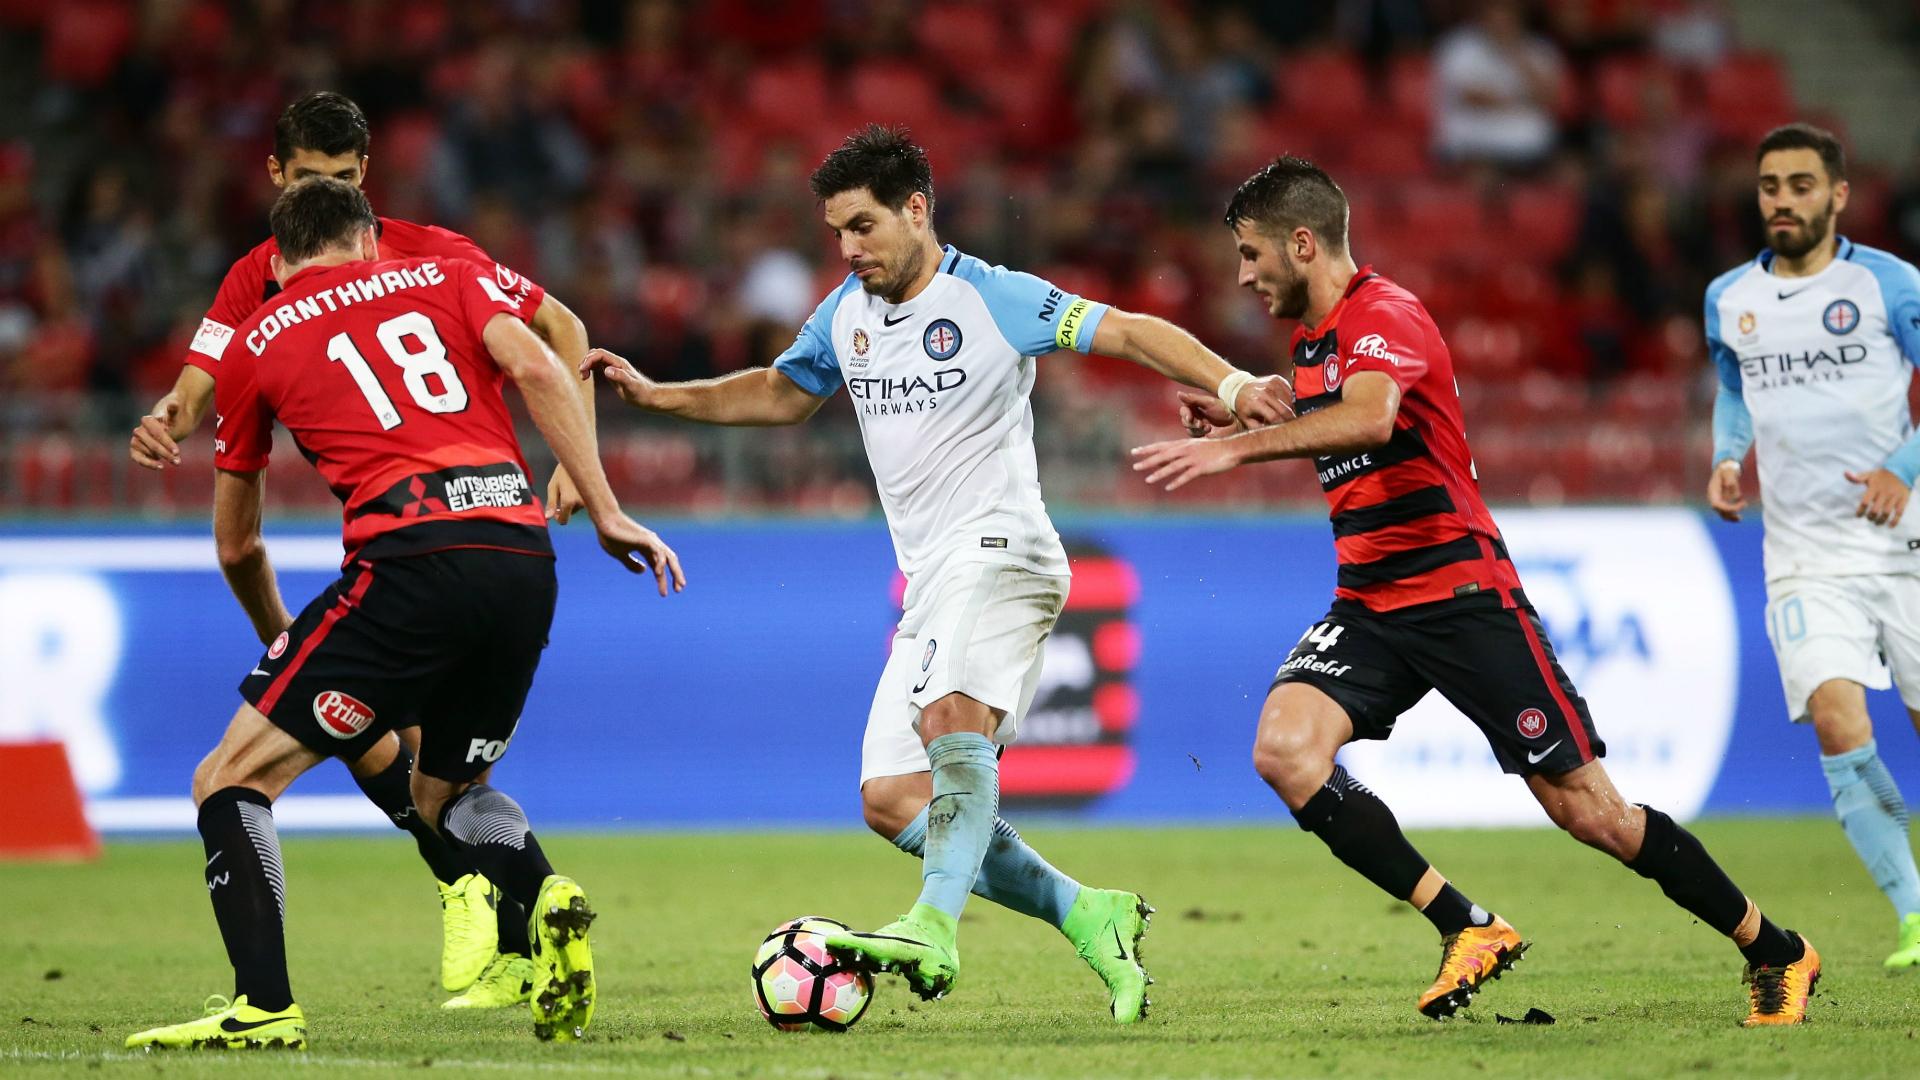 Bruno Fornaroli Western Sydney Wanderers v Melbourne City A-League 24032017